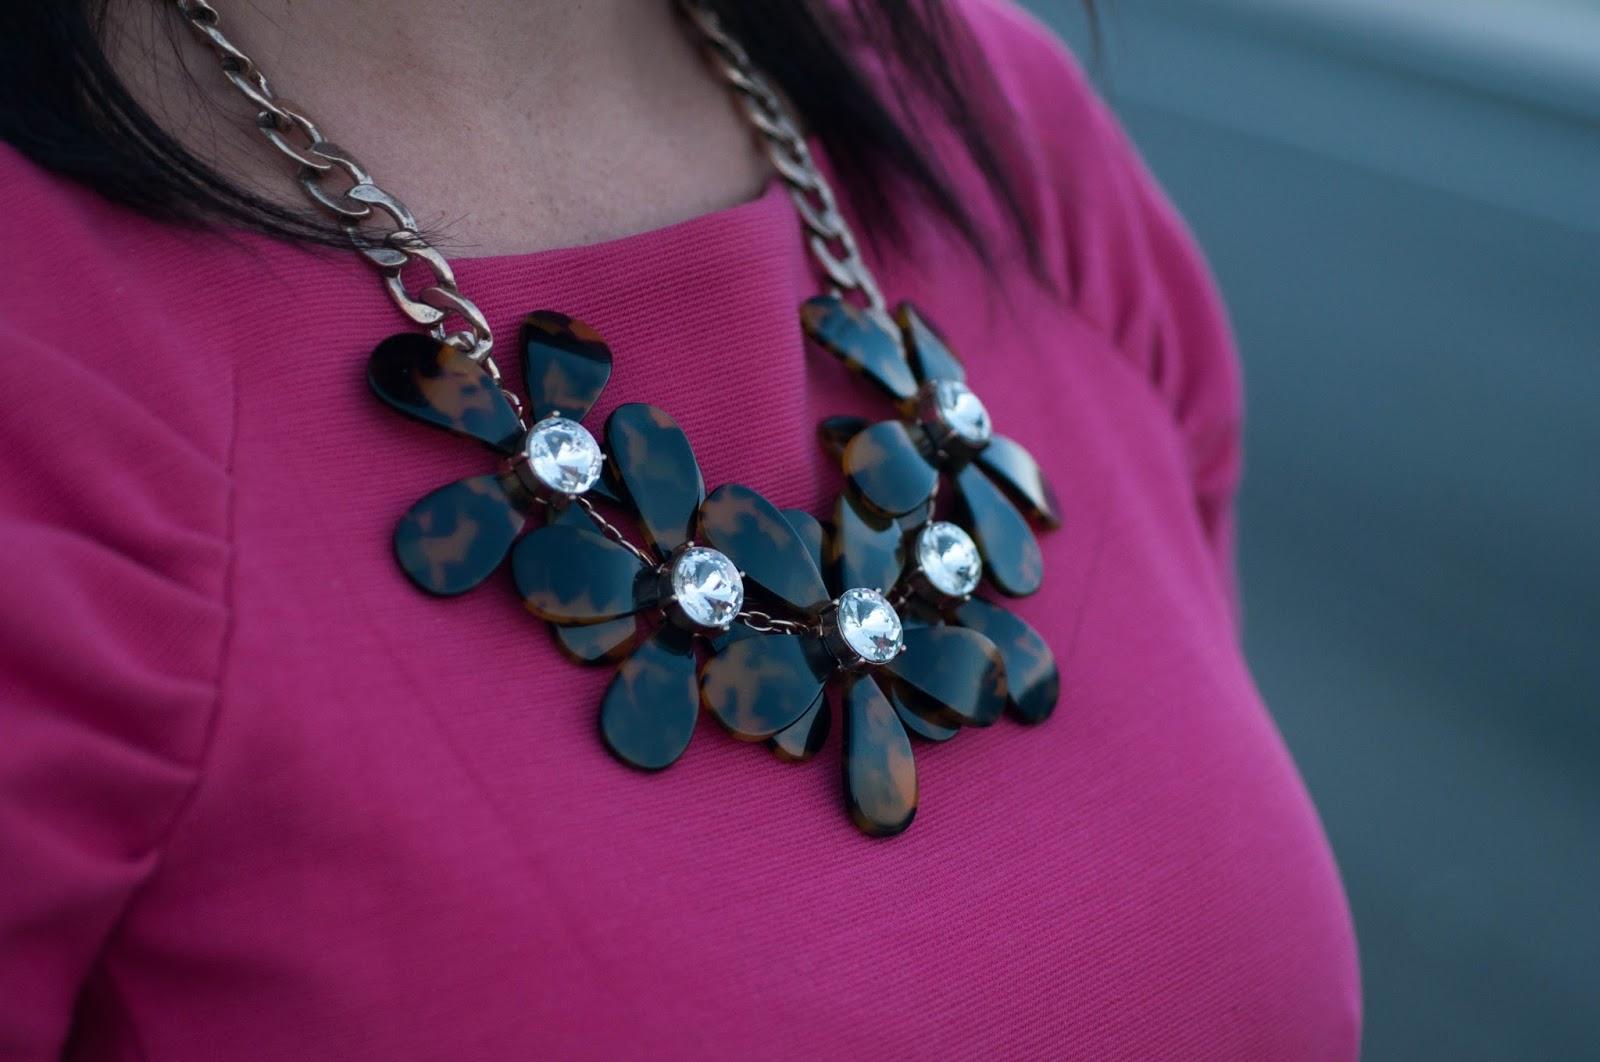 ootd, style blog, fashion blog, banana republic dress, jcrew flower necklace, pink dress, wedding wear, ootd